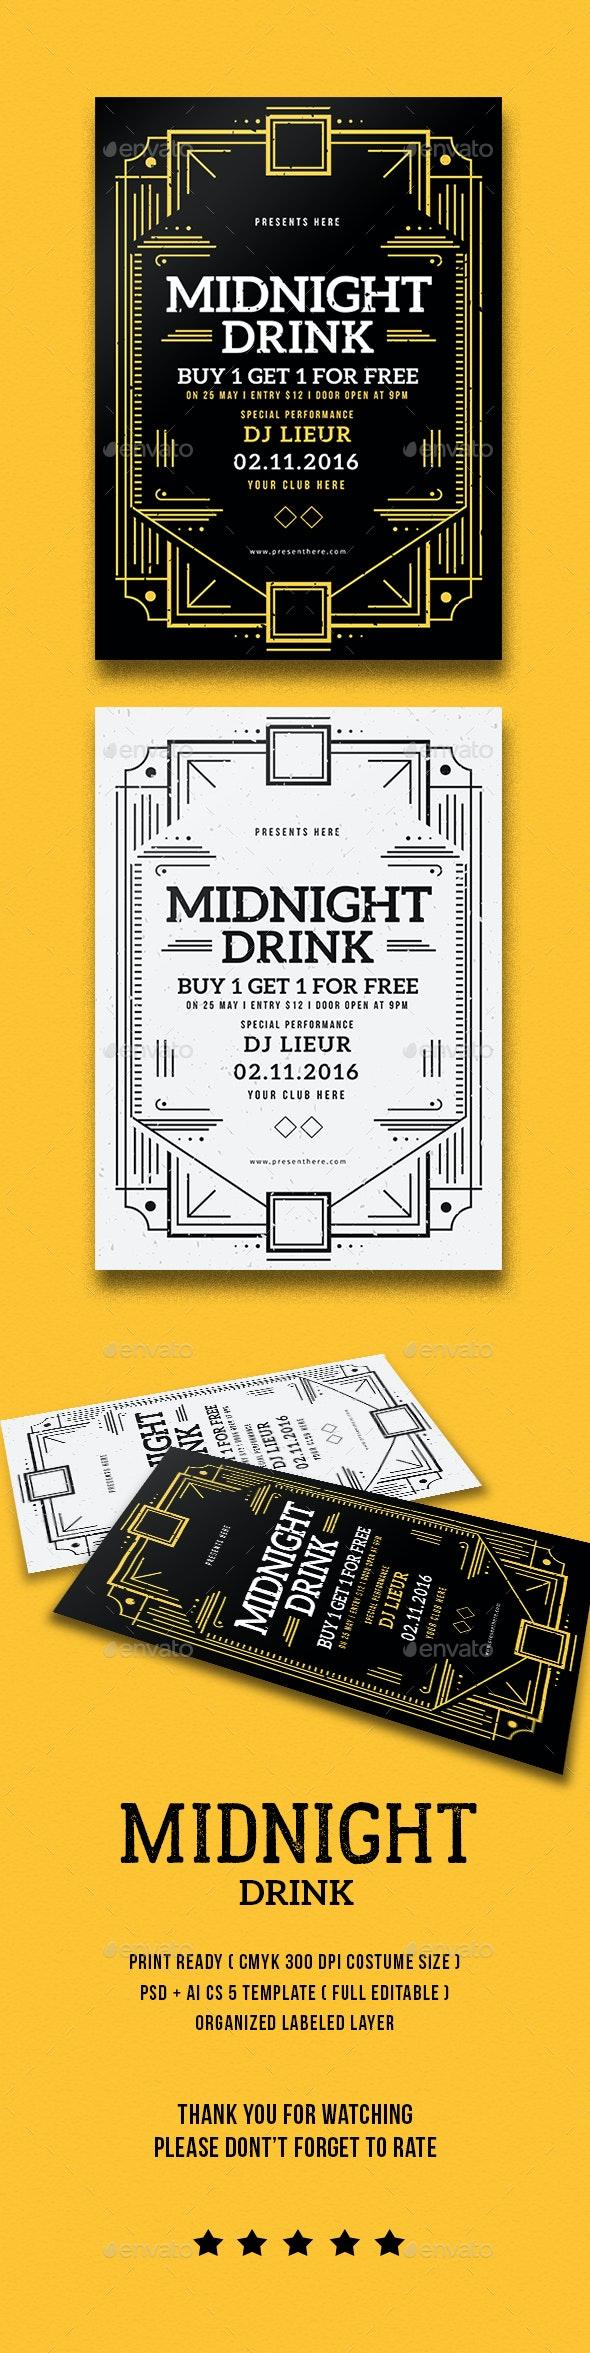 Midnight Drink Flyer - Flyers Print Templates